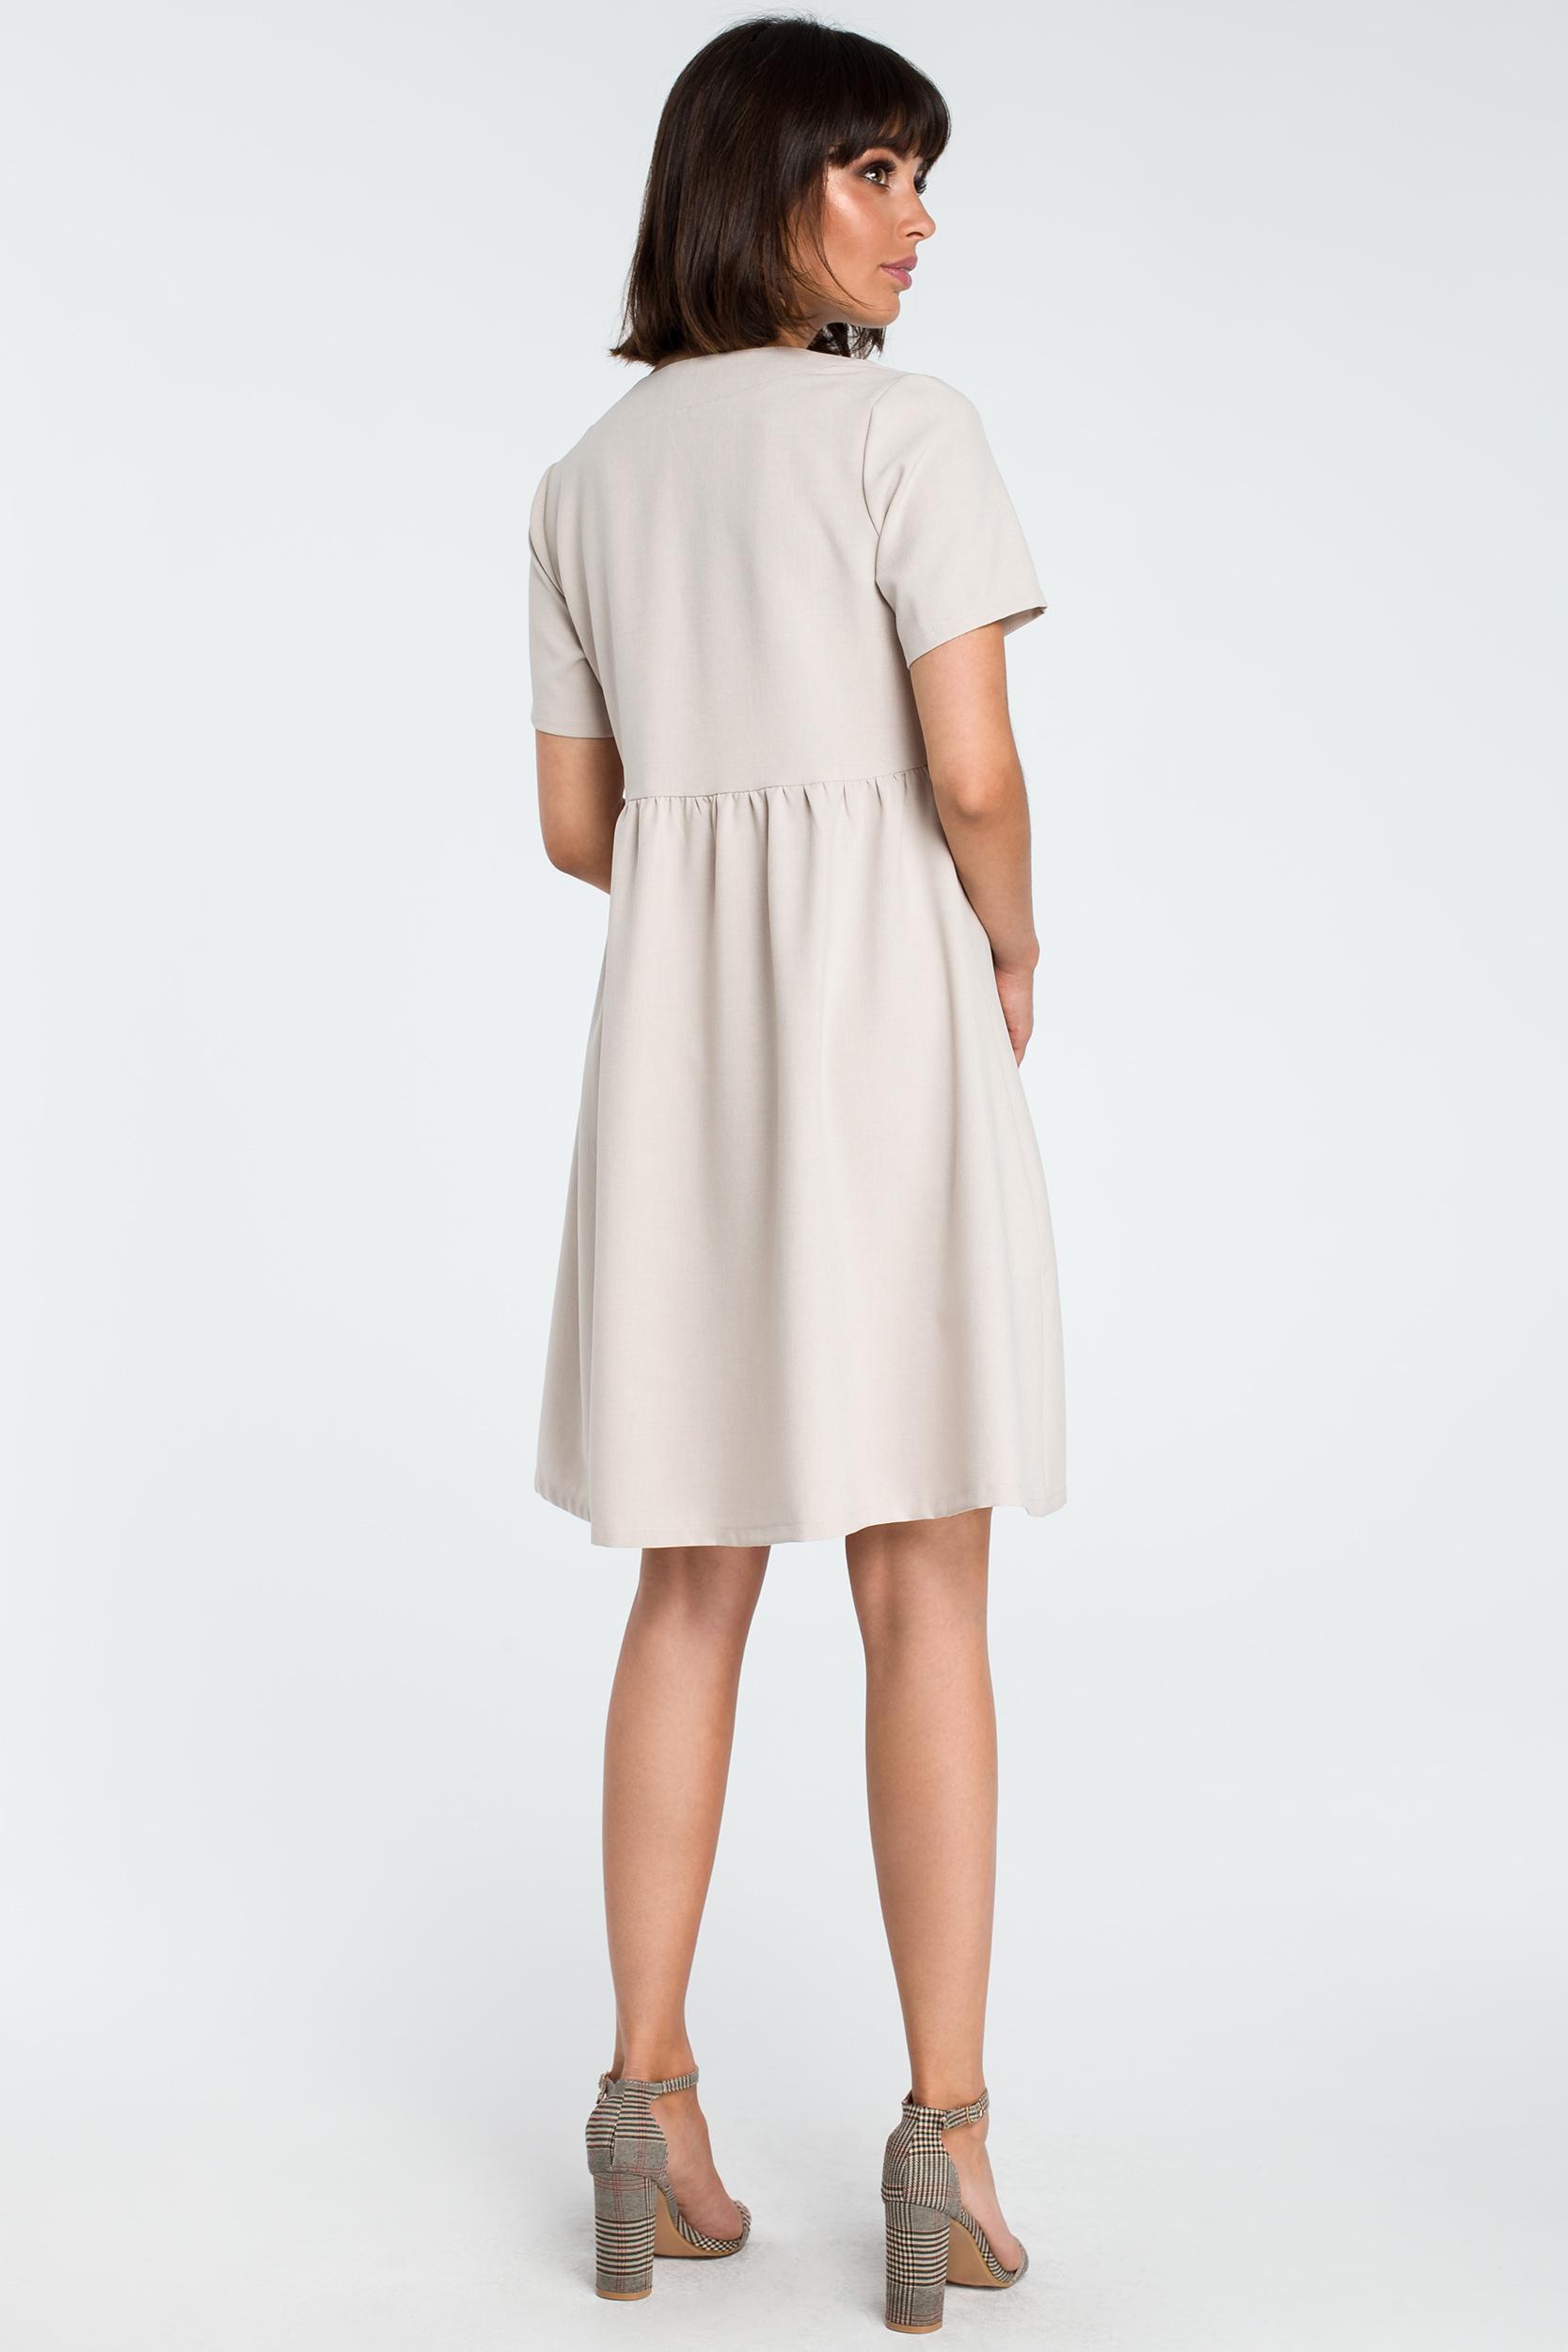 CM3757 Sukienka mini odcinana pod biustem - beżowa